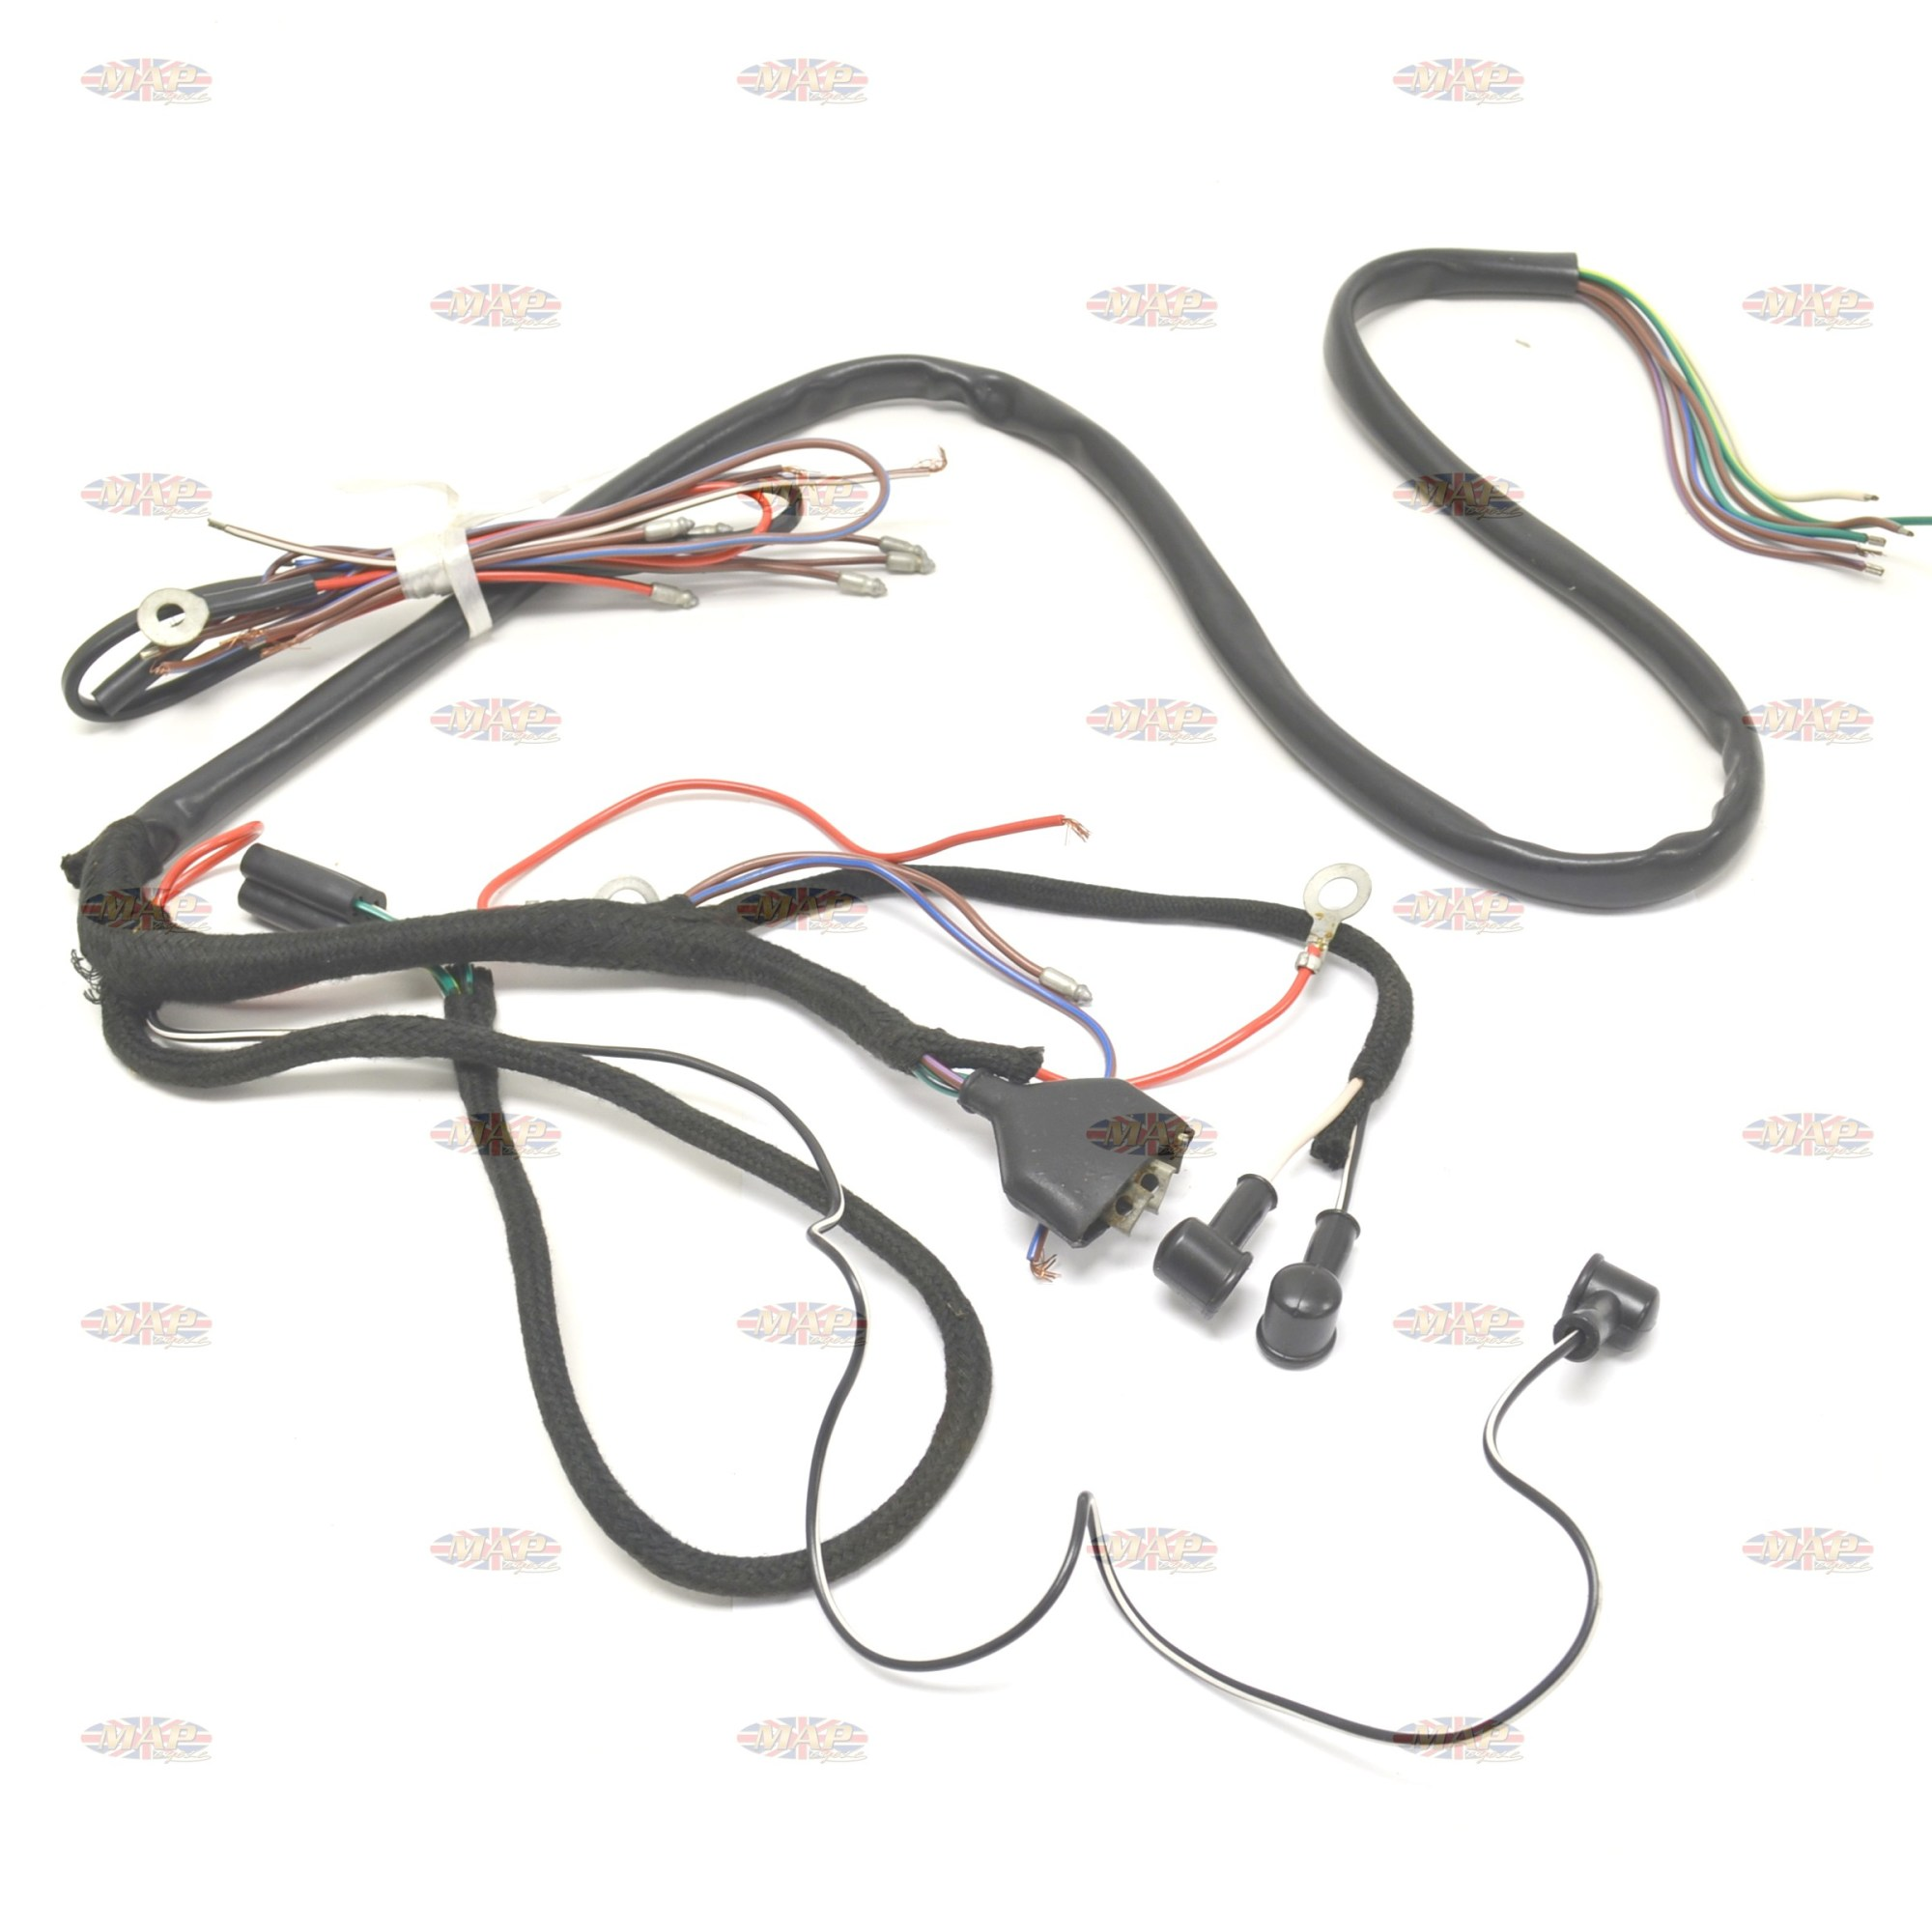 hight resolution of triumph 1957 63 5ta 6t 3ta oe factory lucas wiring harness 794981